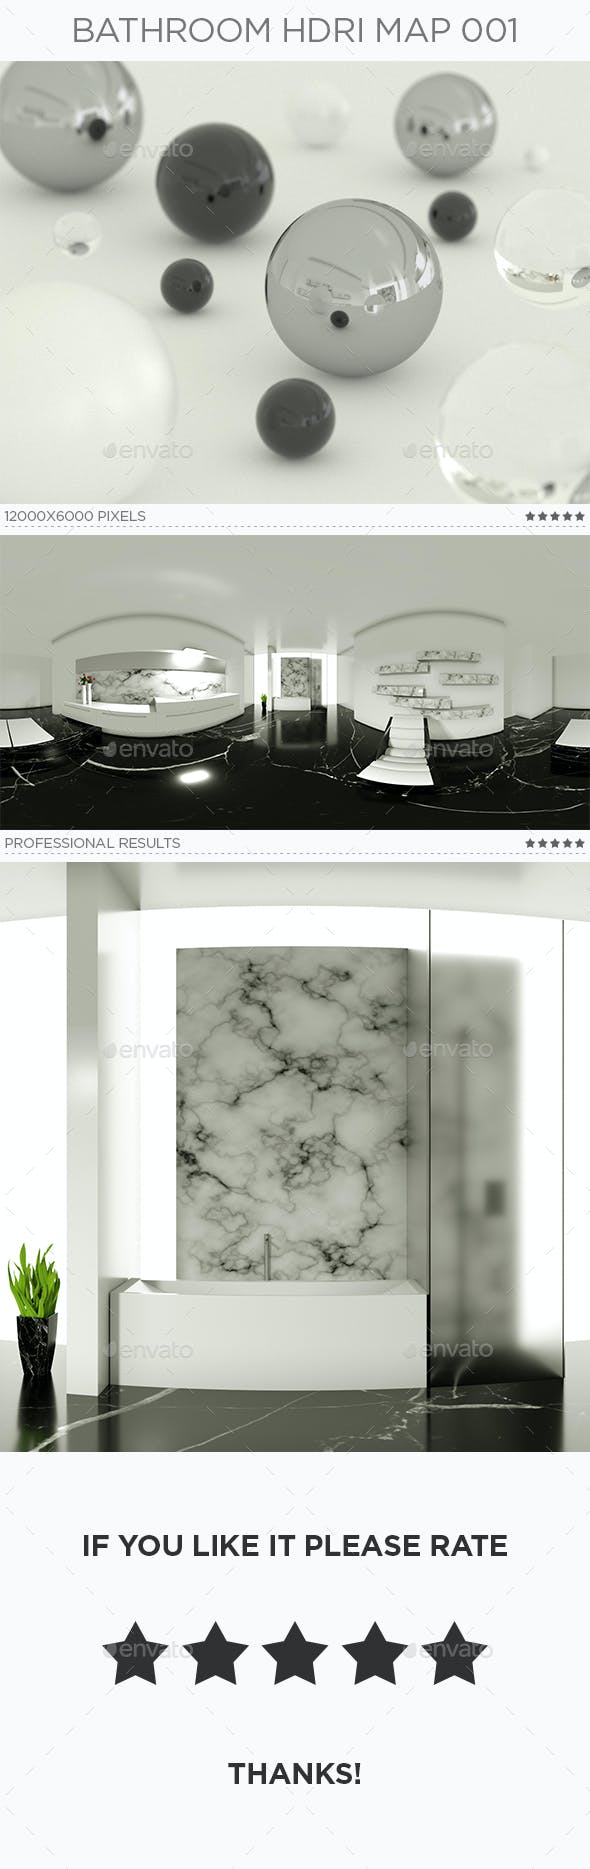 Bathroom HDRi Map 001 - 3DOcean Item for Sale